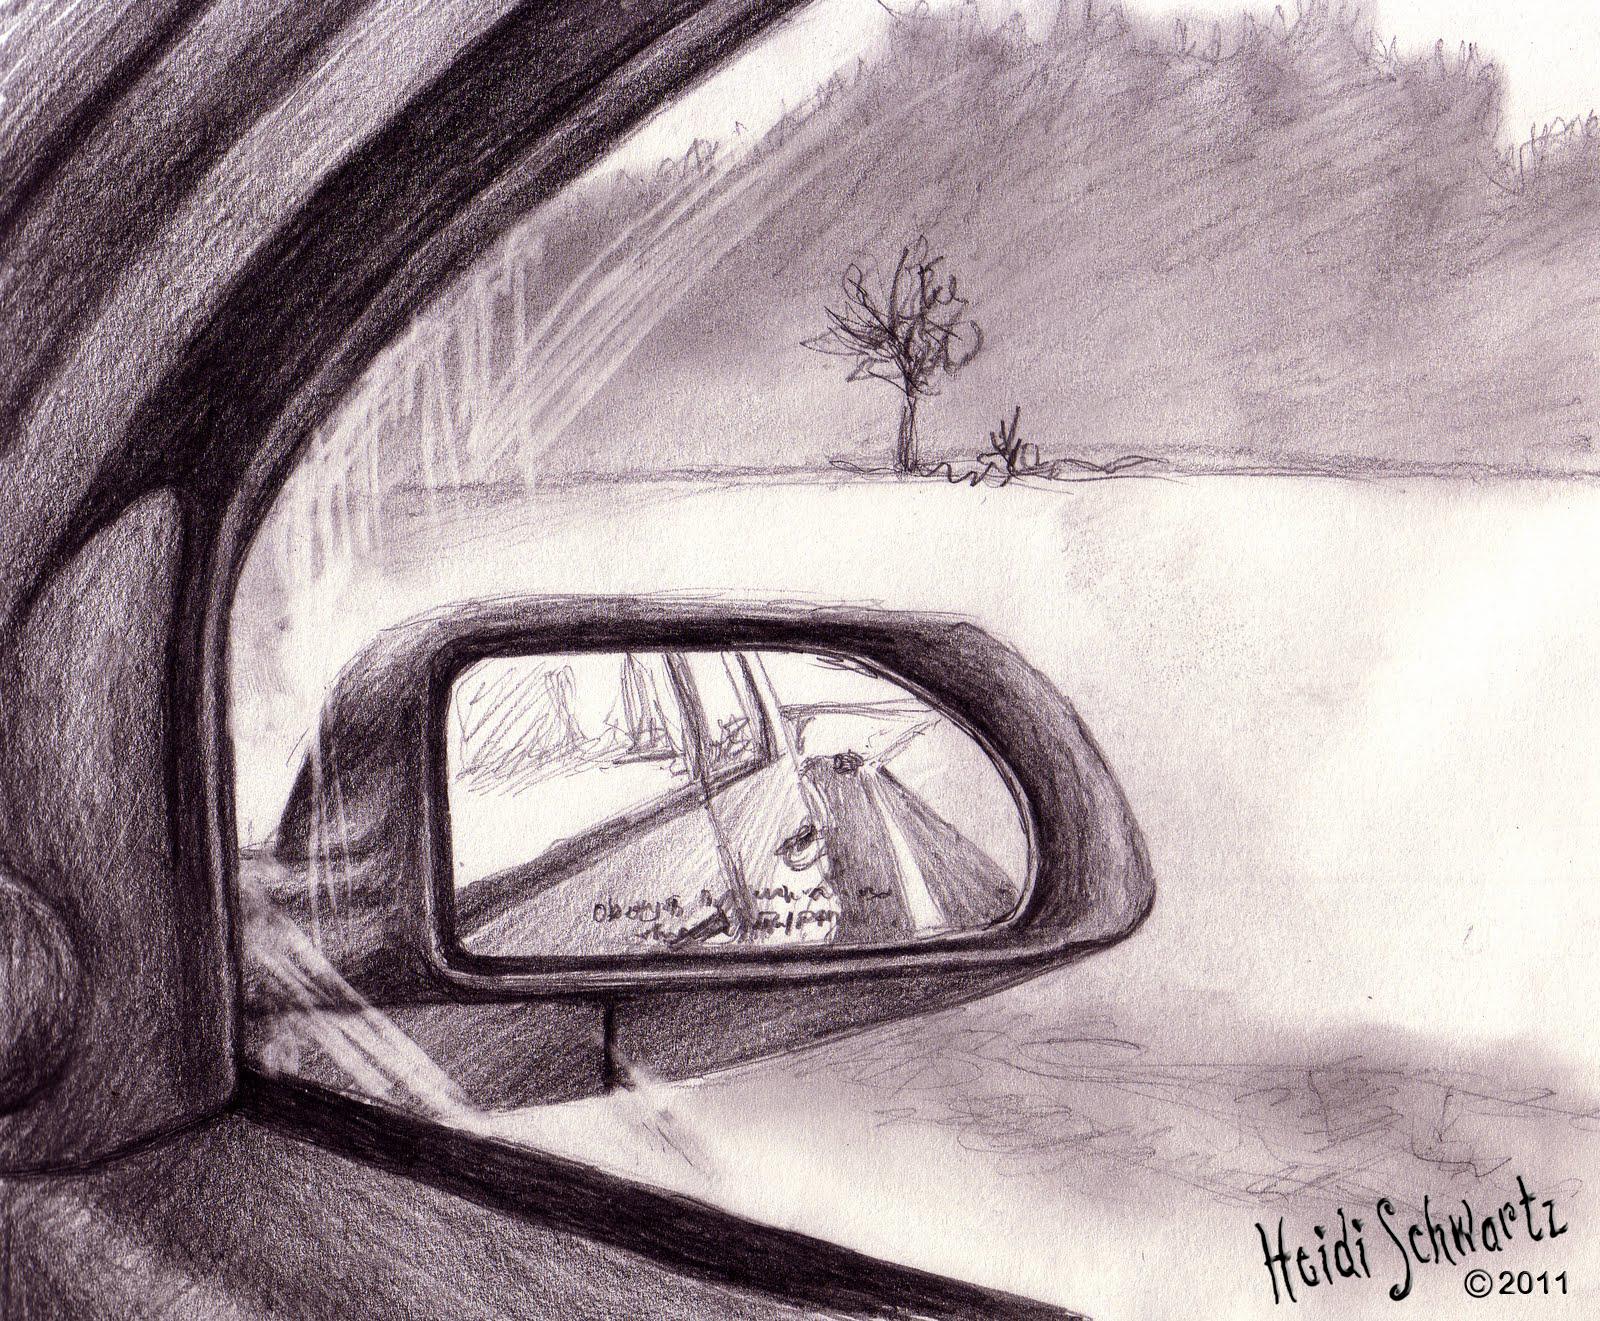 Heidi Schwartz Road Trip Sketches Hands Trees Trucks Mirrors